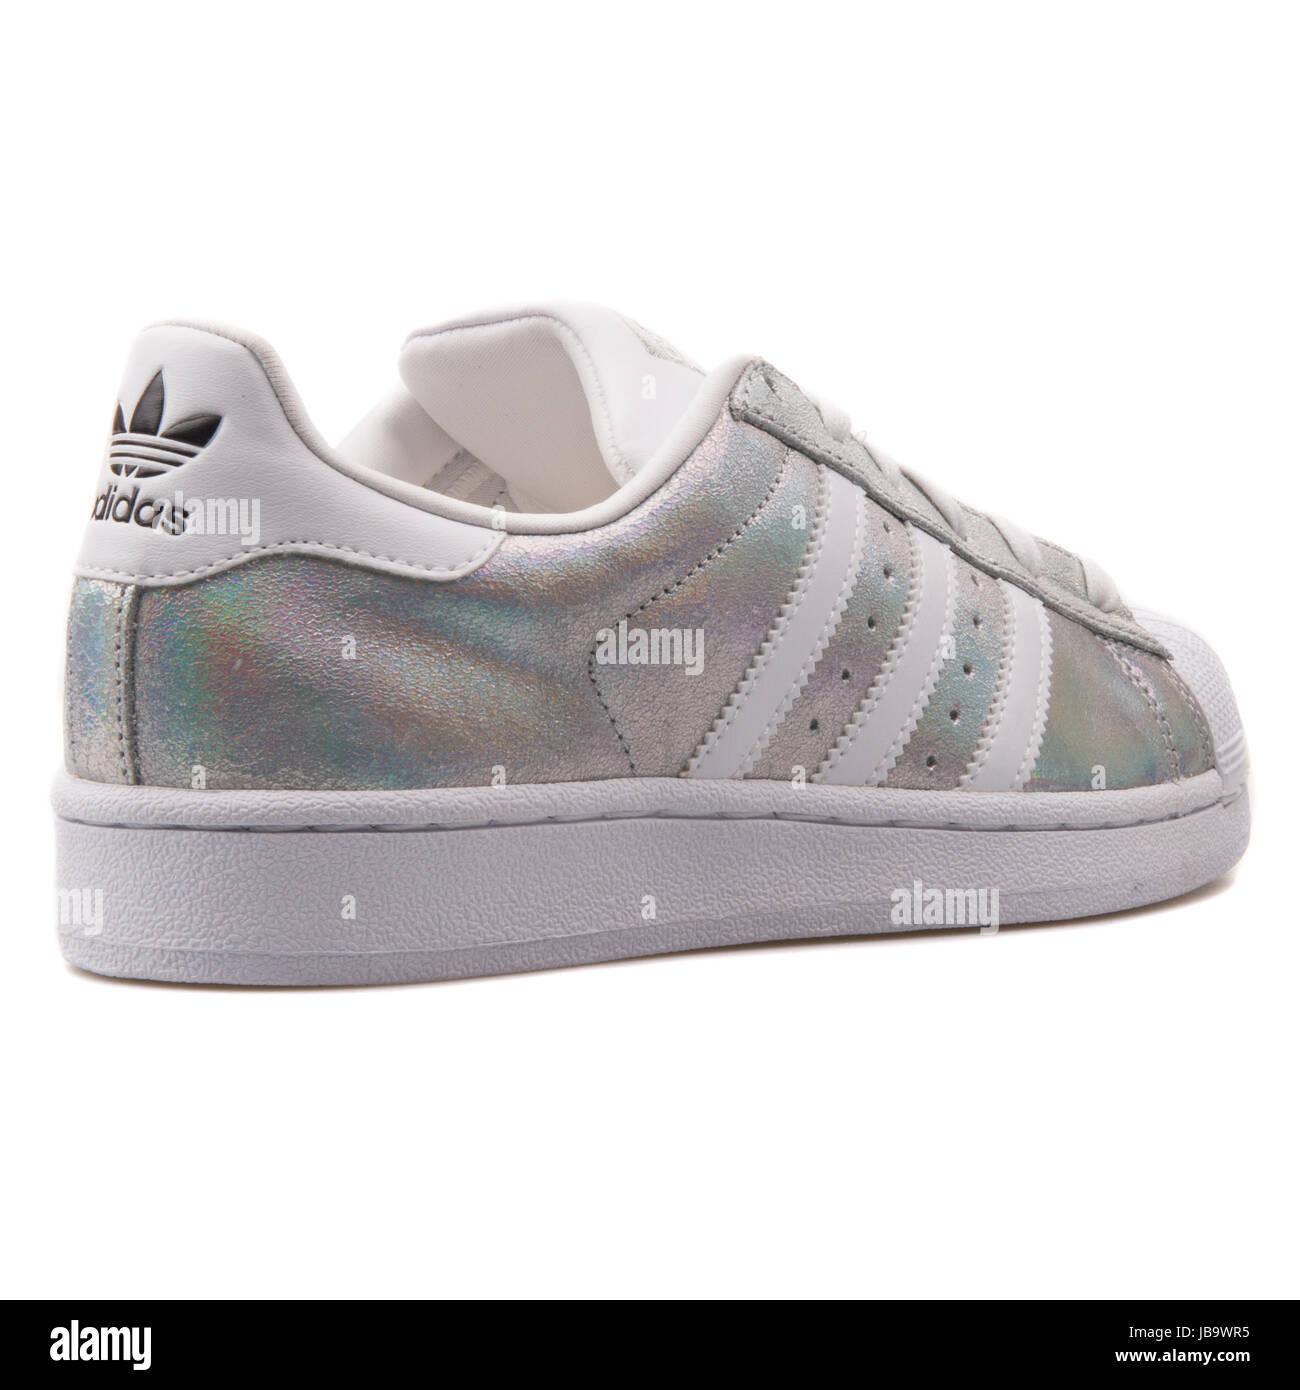 Bilder StockfotosAdidas Sneaker Alamy Adidas Sneaker Yyfvb76g